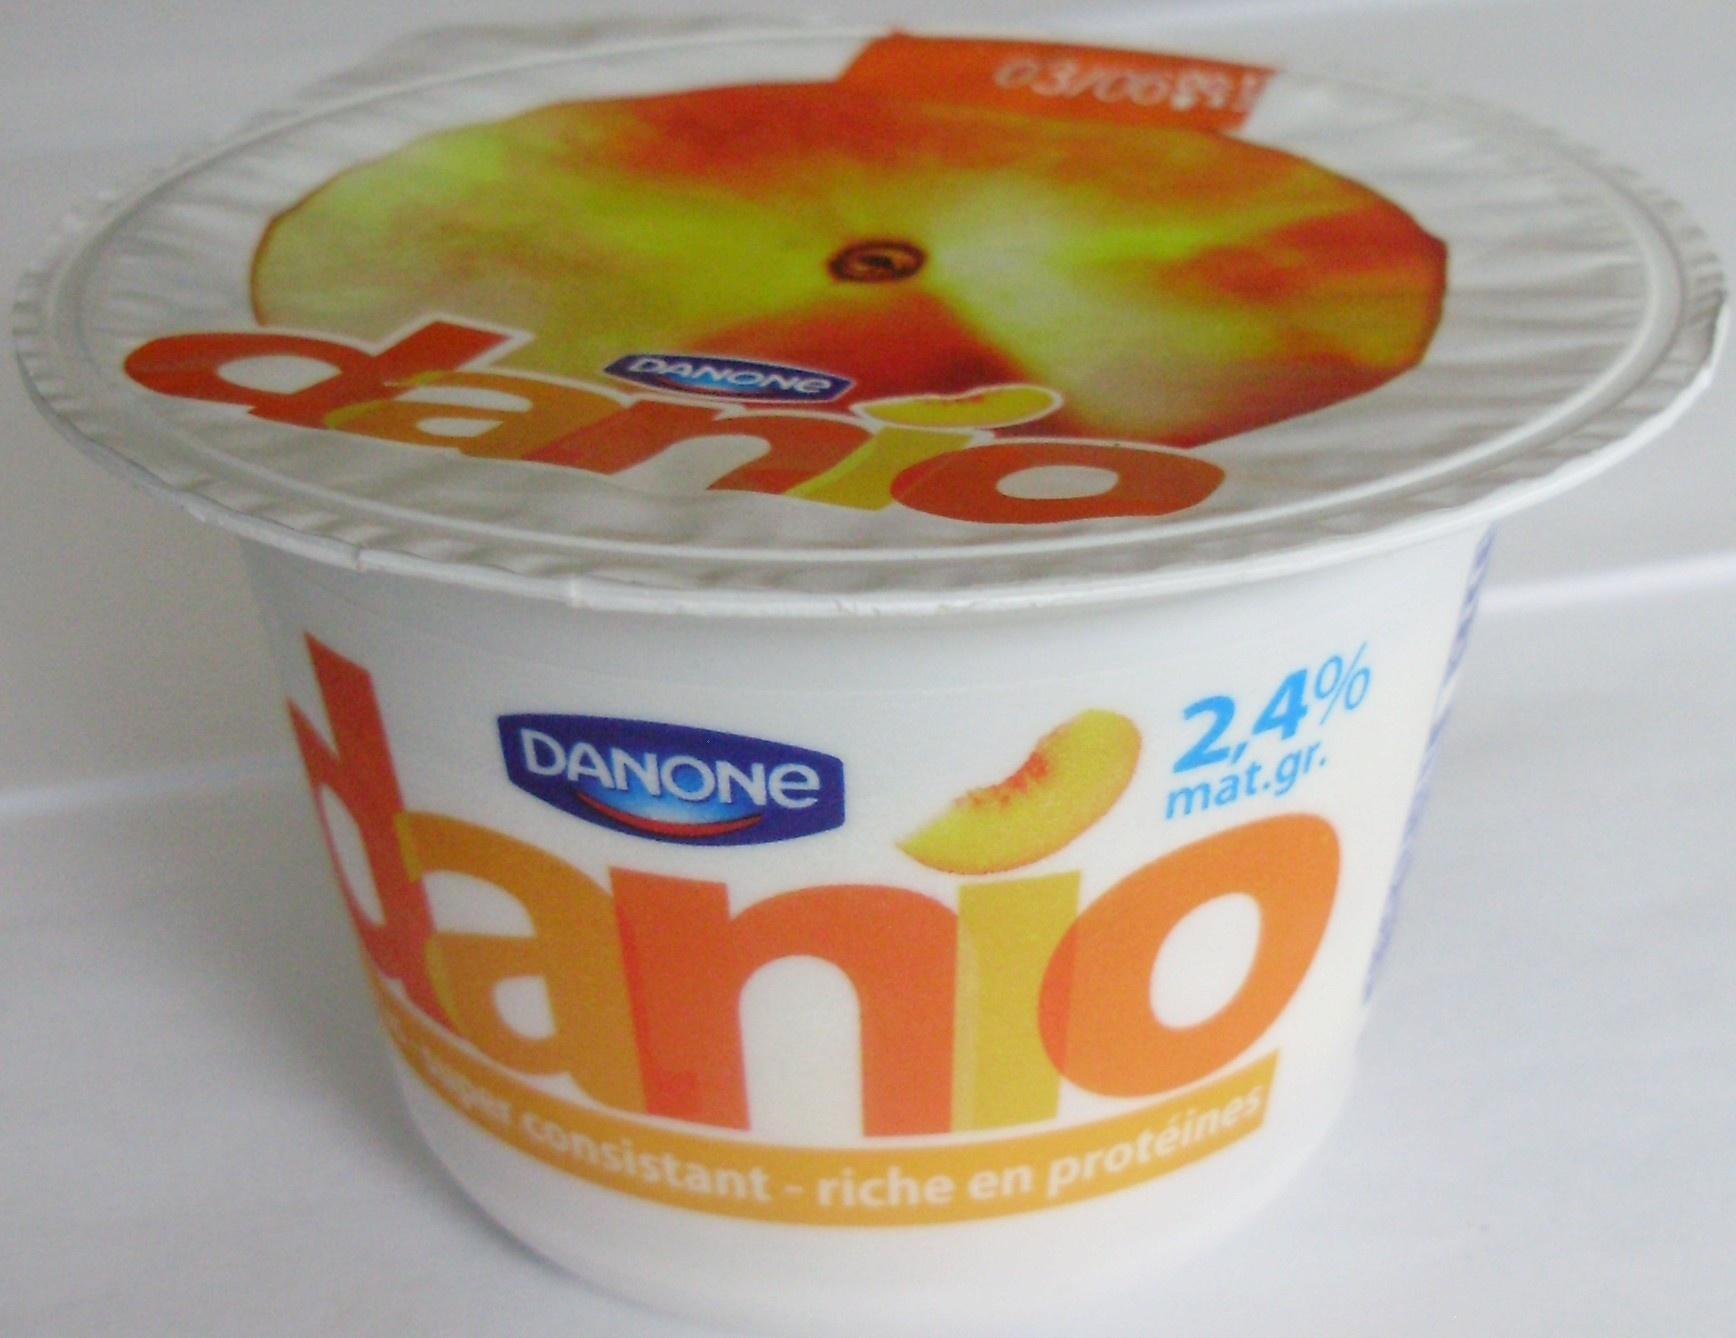 Danio Pêche (2,4 % MG) - Product - fr